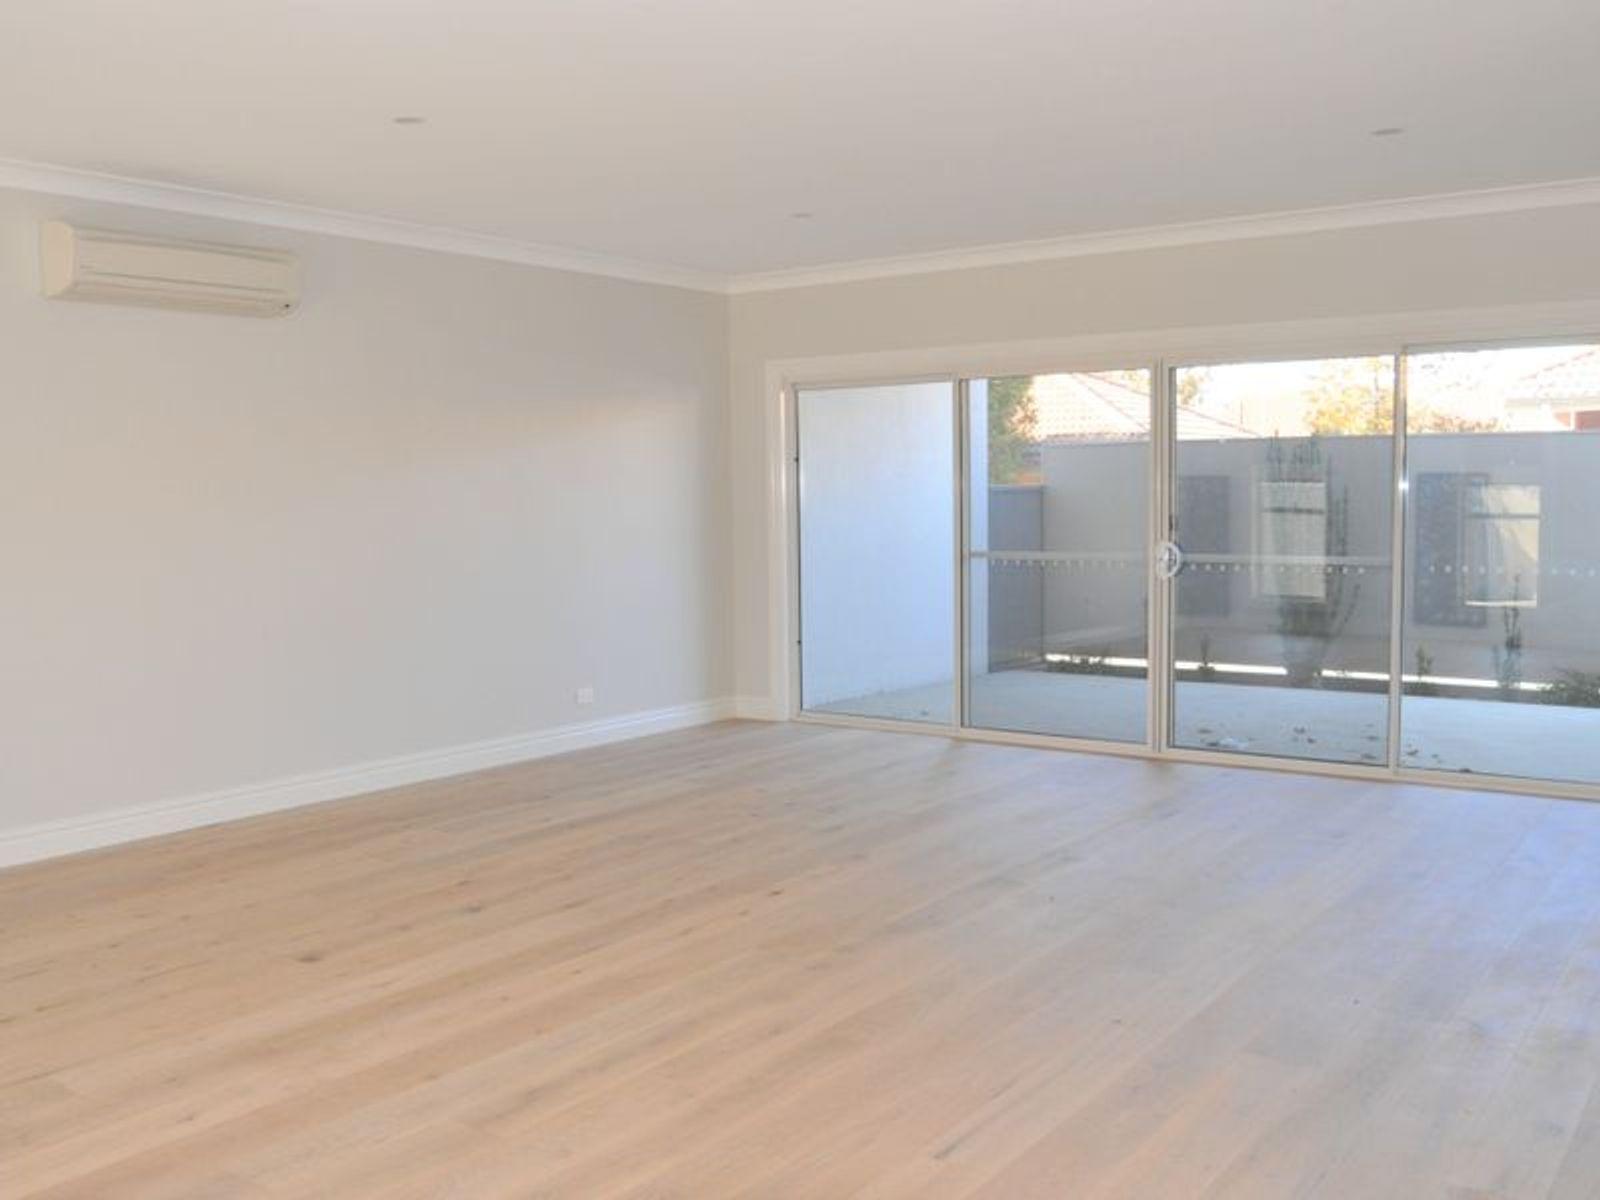 340B Howick Street, Bathurst, NSW 2795